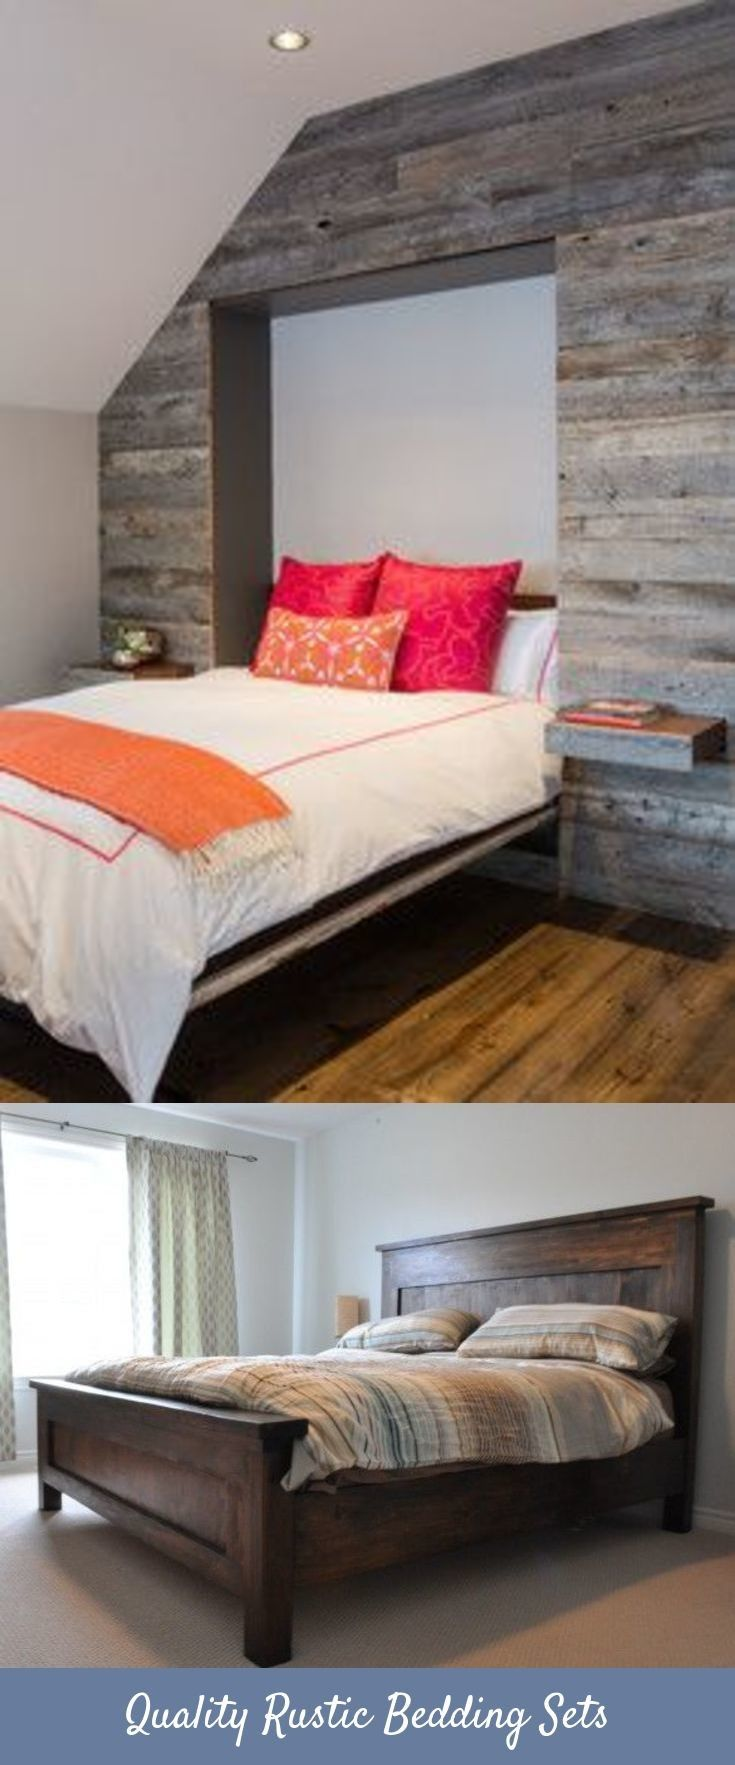 cool bed linen tips rustic bedding sets pinterest rustic